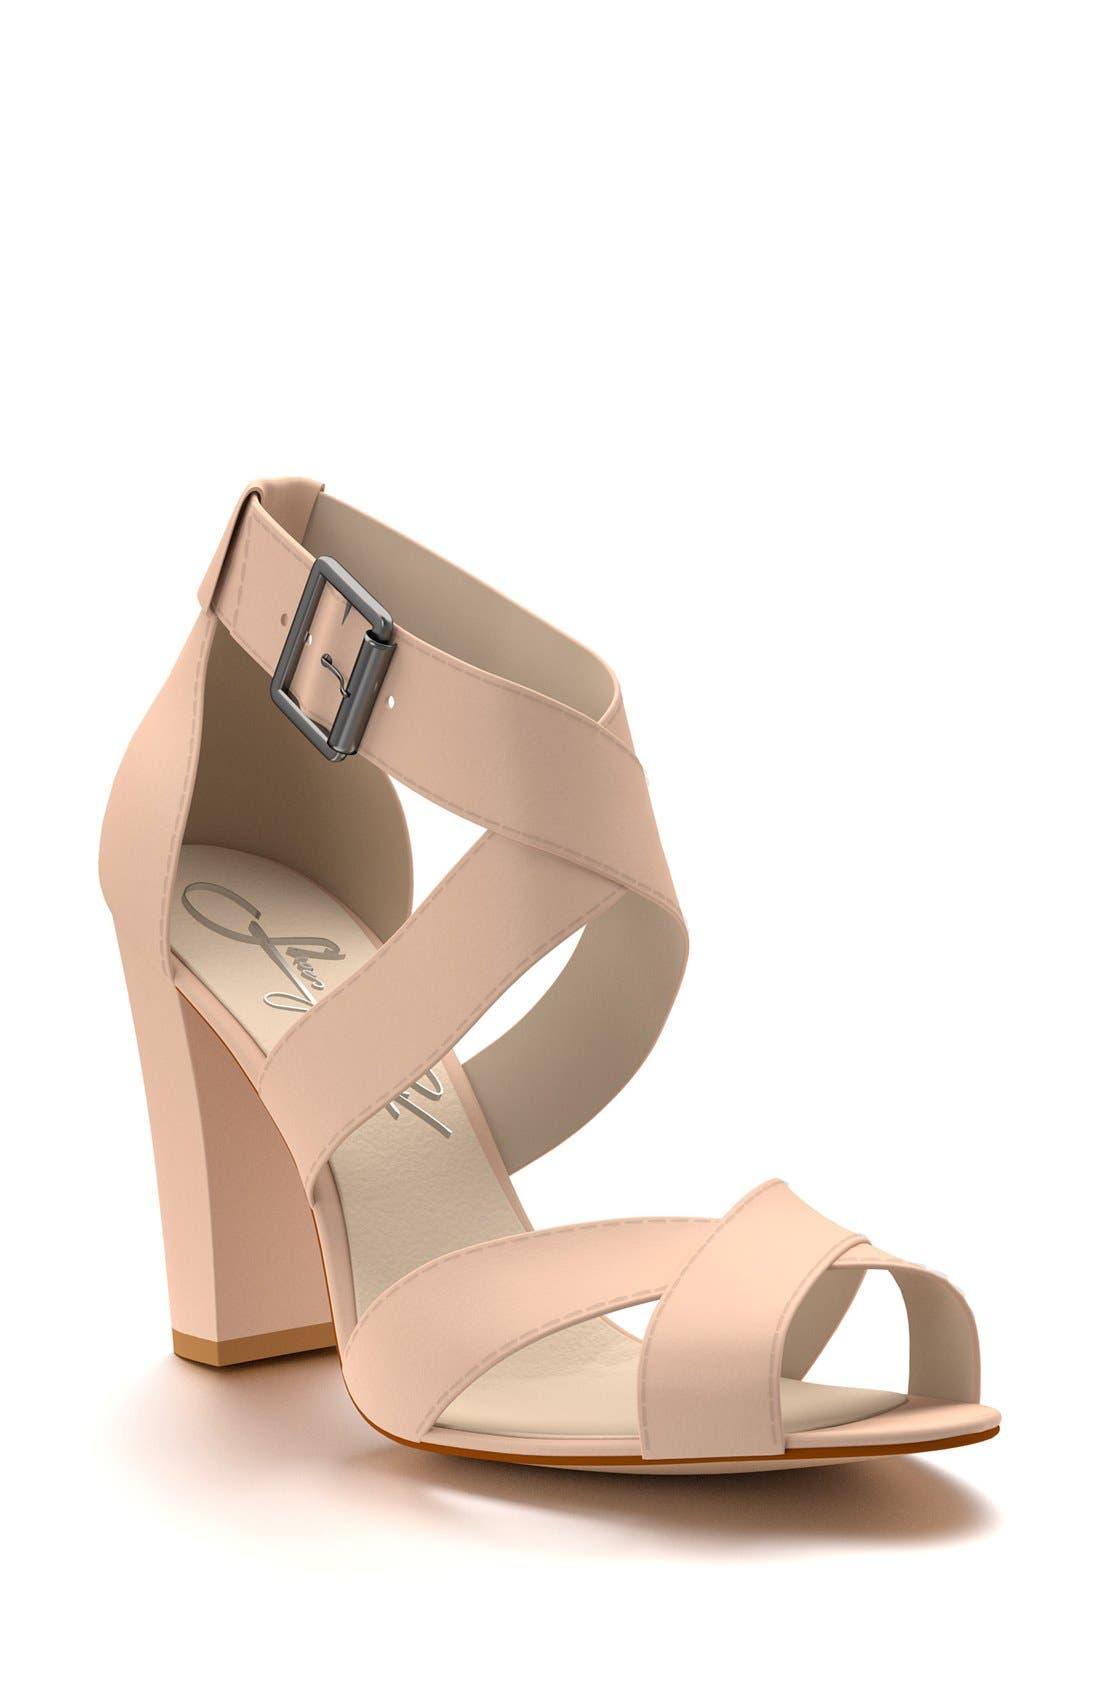 Alternate Image 1 Selected - Shoes of Prey Crisscross Strap Block Heel Sandal (Women)